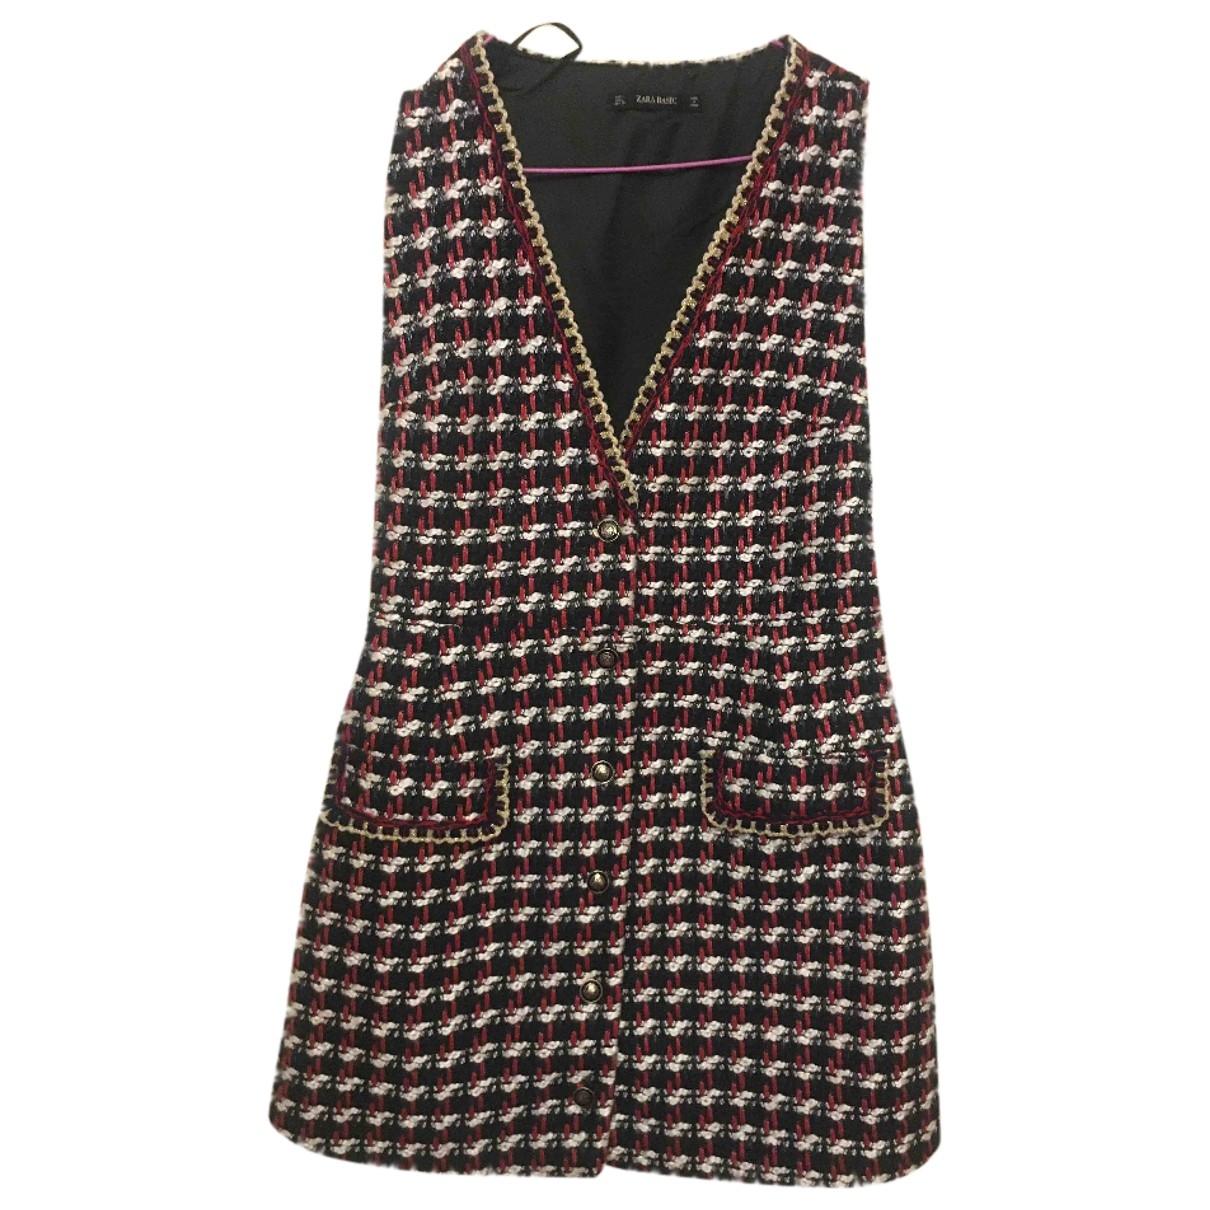 Zara \N Multicolour Tweed dress for Women L International